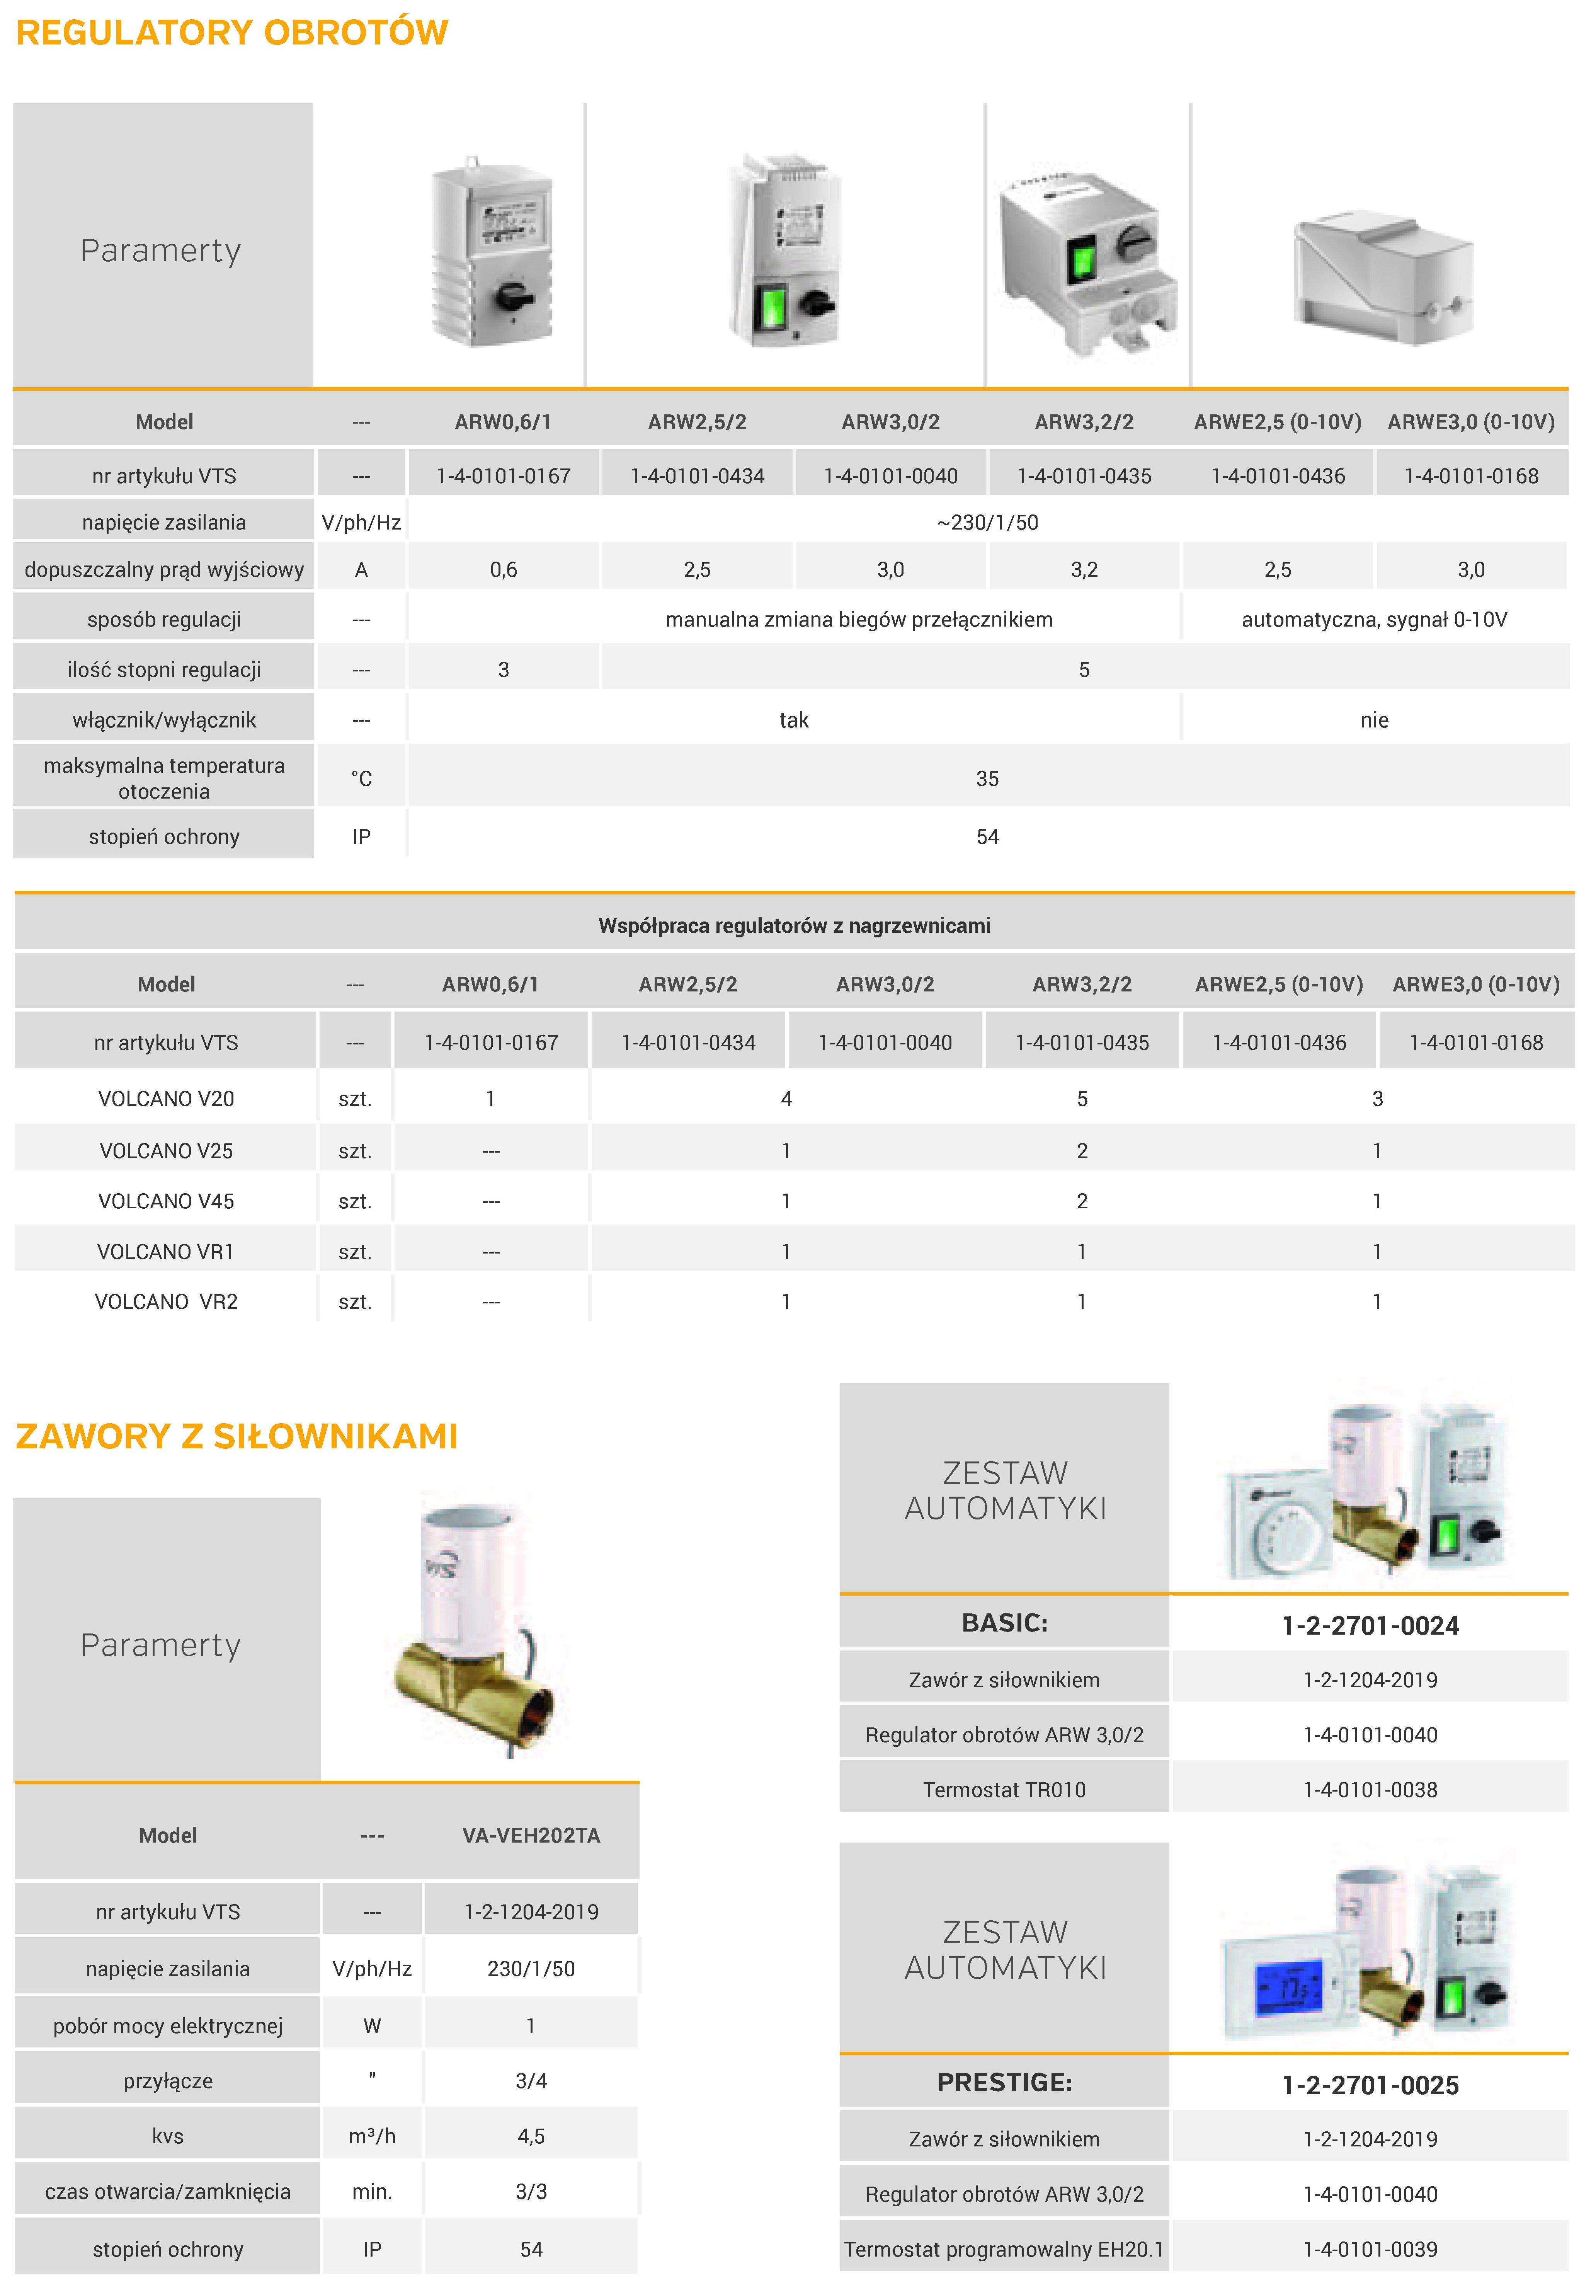 Автоматика для VOLCANO V45 VTS EUROHEAT